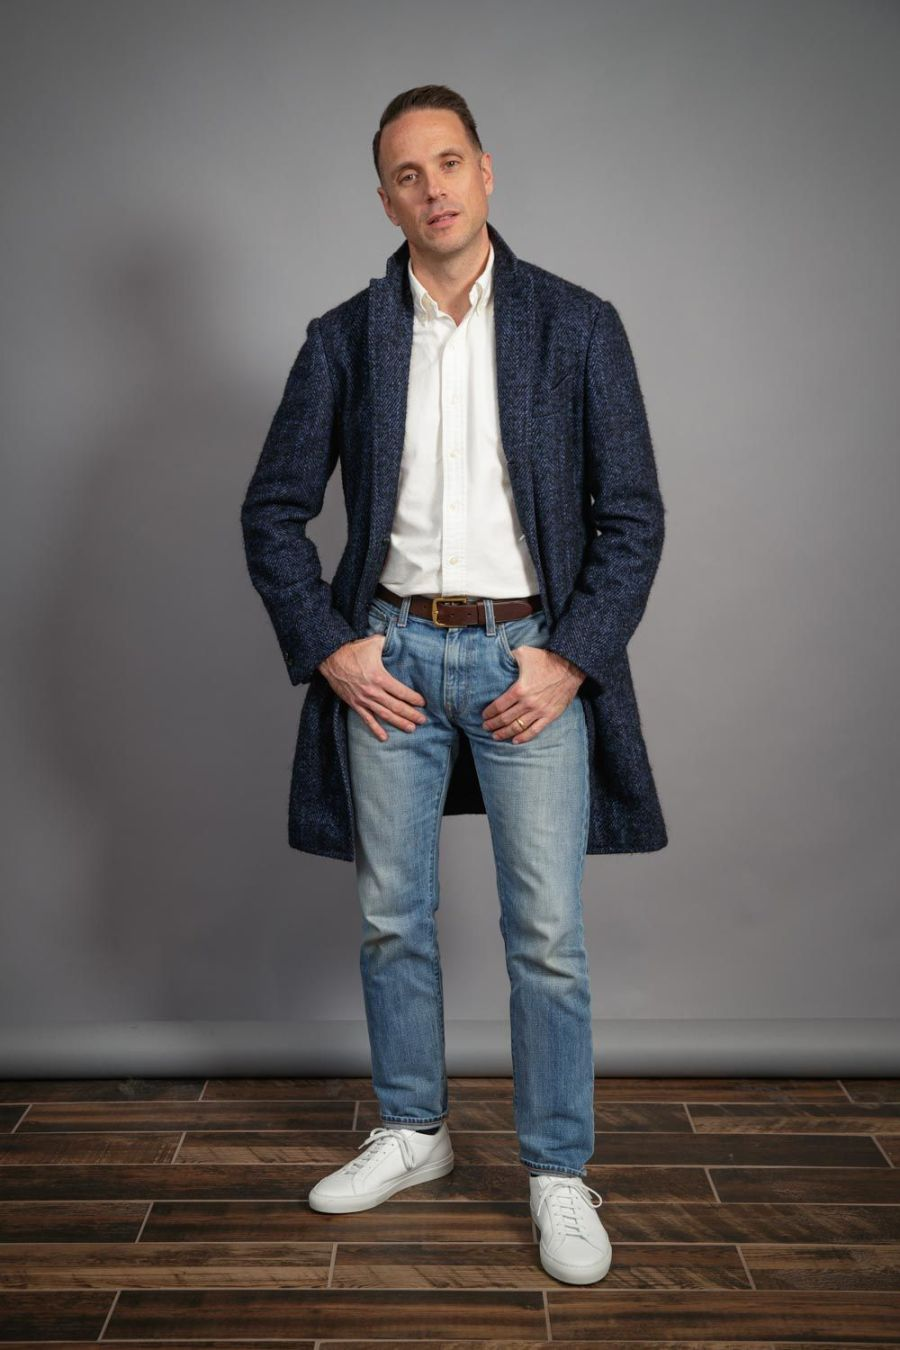 light-wash-denim-white-oxford-shirt-white-sneakers-navy-overcoat-mens-capsule-wardrobe